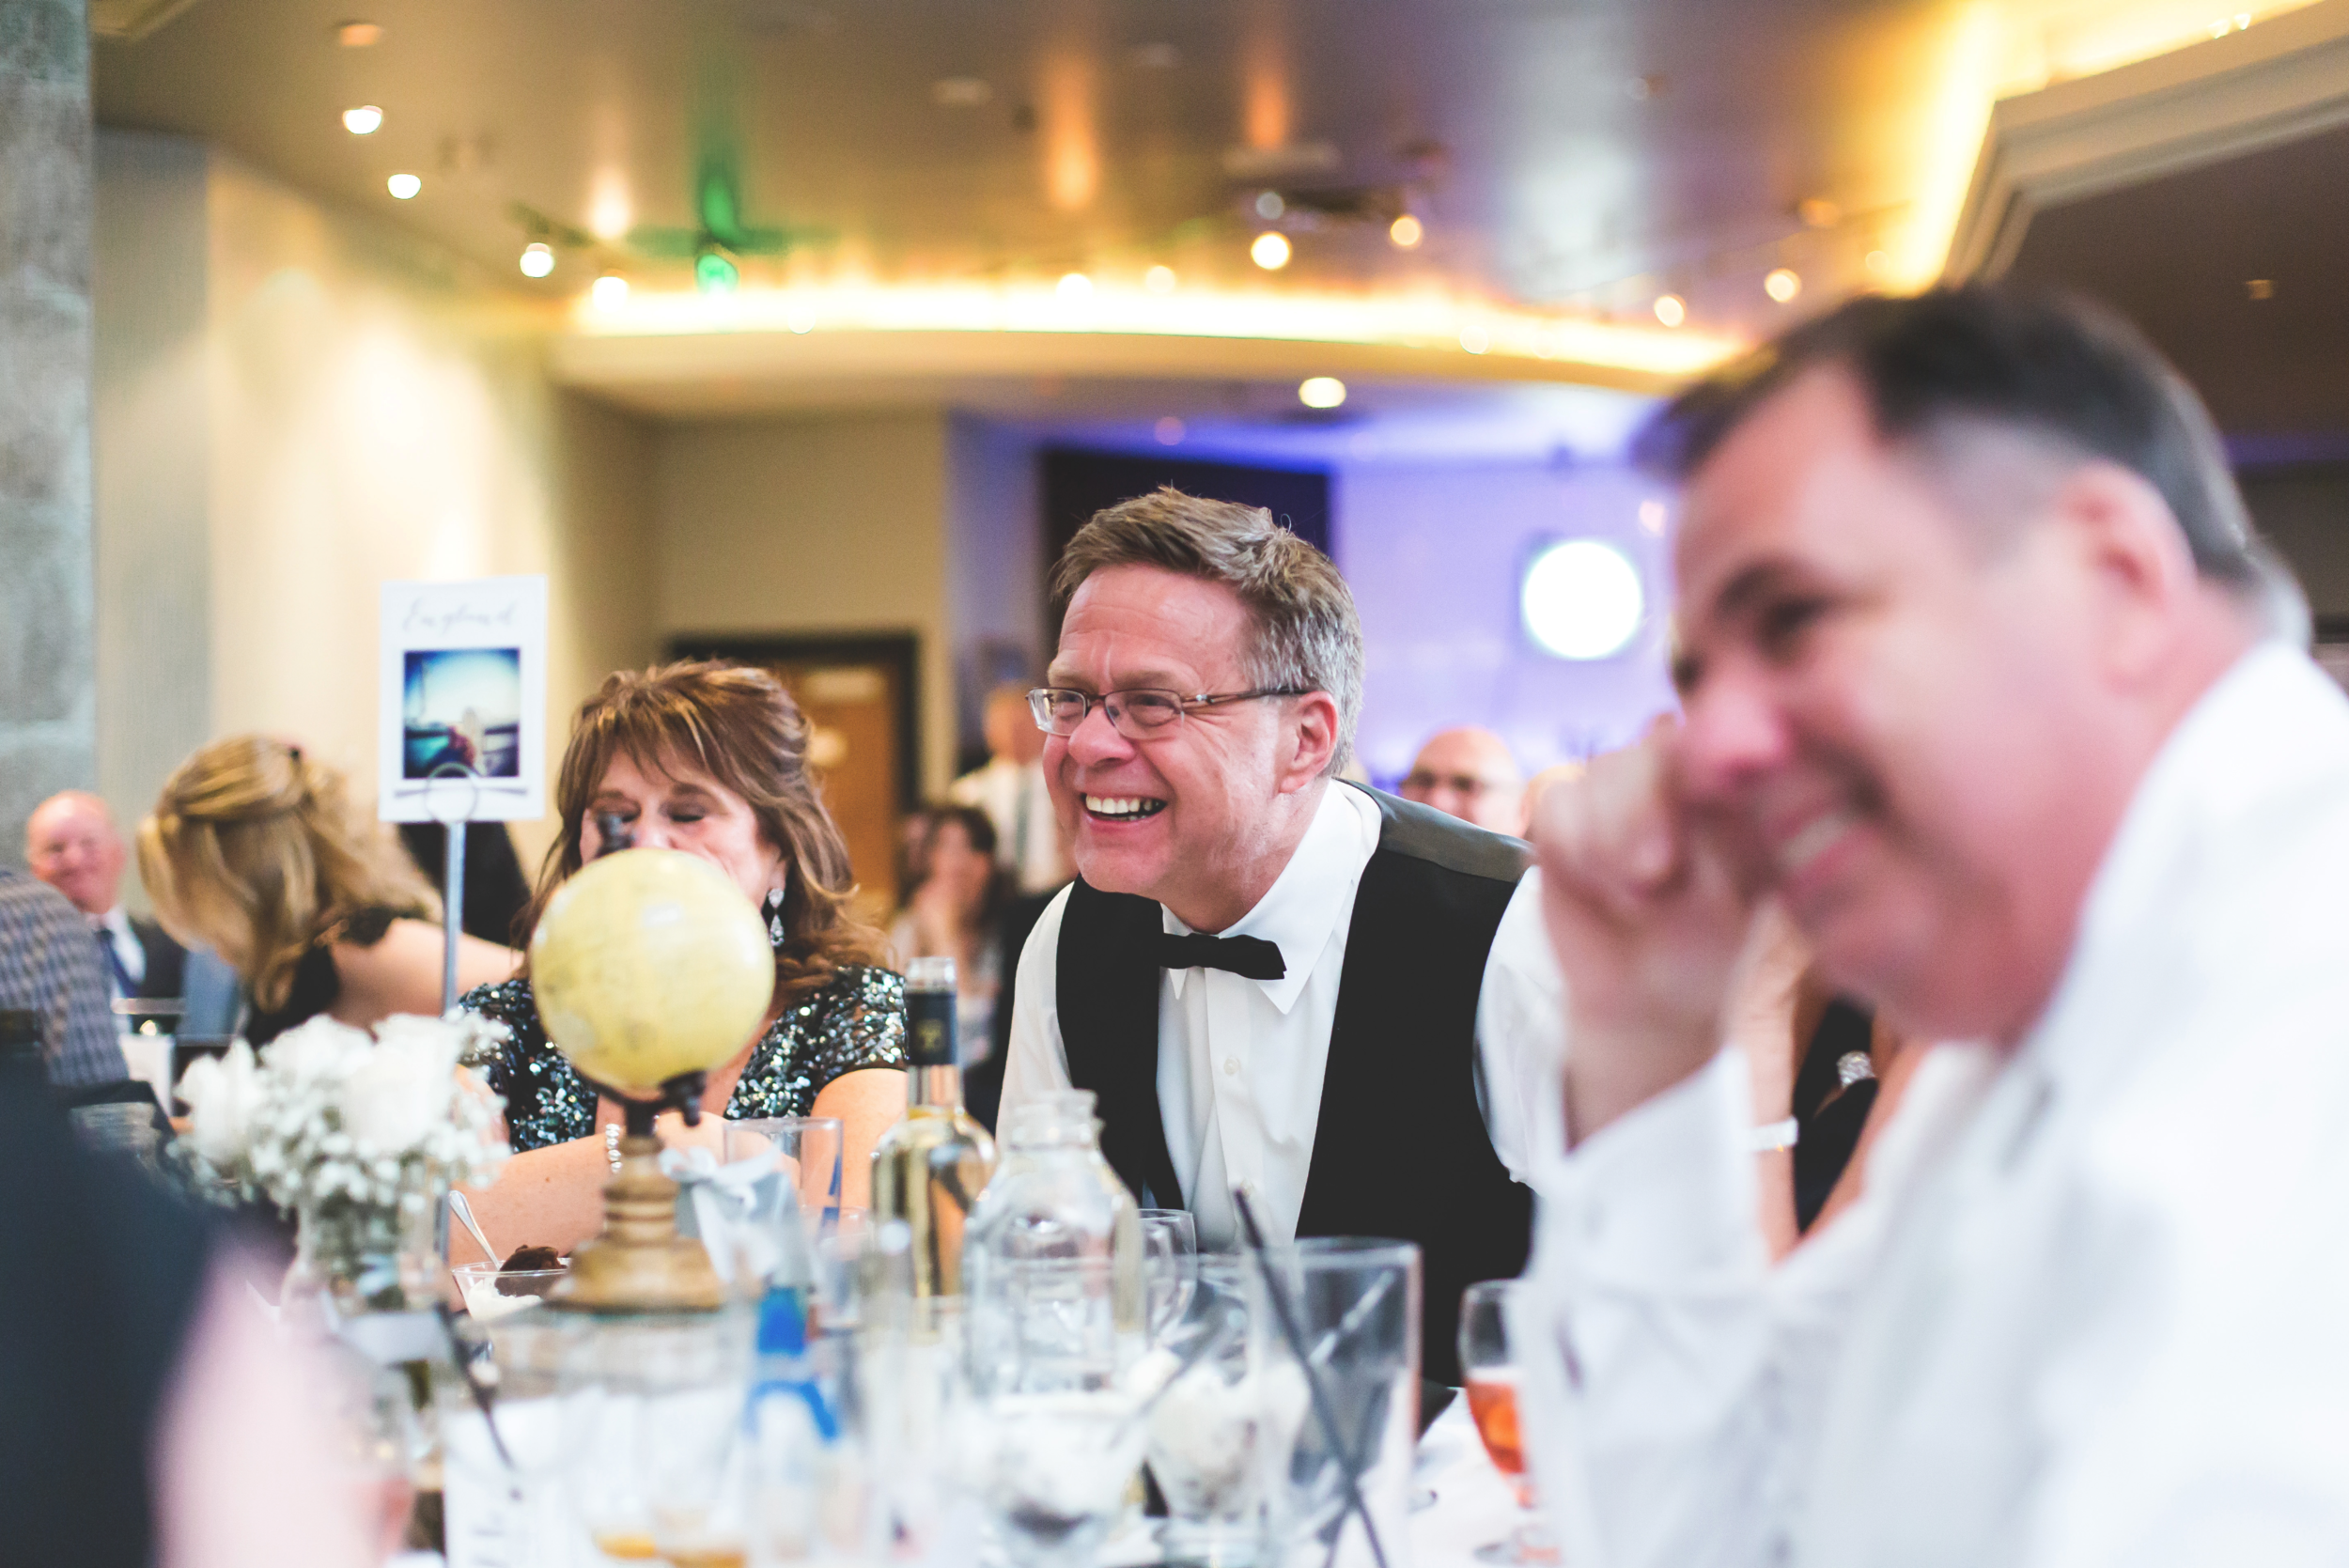 Wedding-Harbour-Banquet-Center-Oakville-Photographer-Wedding-Hamilton-Saint-James-Espresso-Downtown-HamOnt-GTA-Niagara-Toronto-Moments-by-Lauren-Photography-Photo-Image-68.png